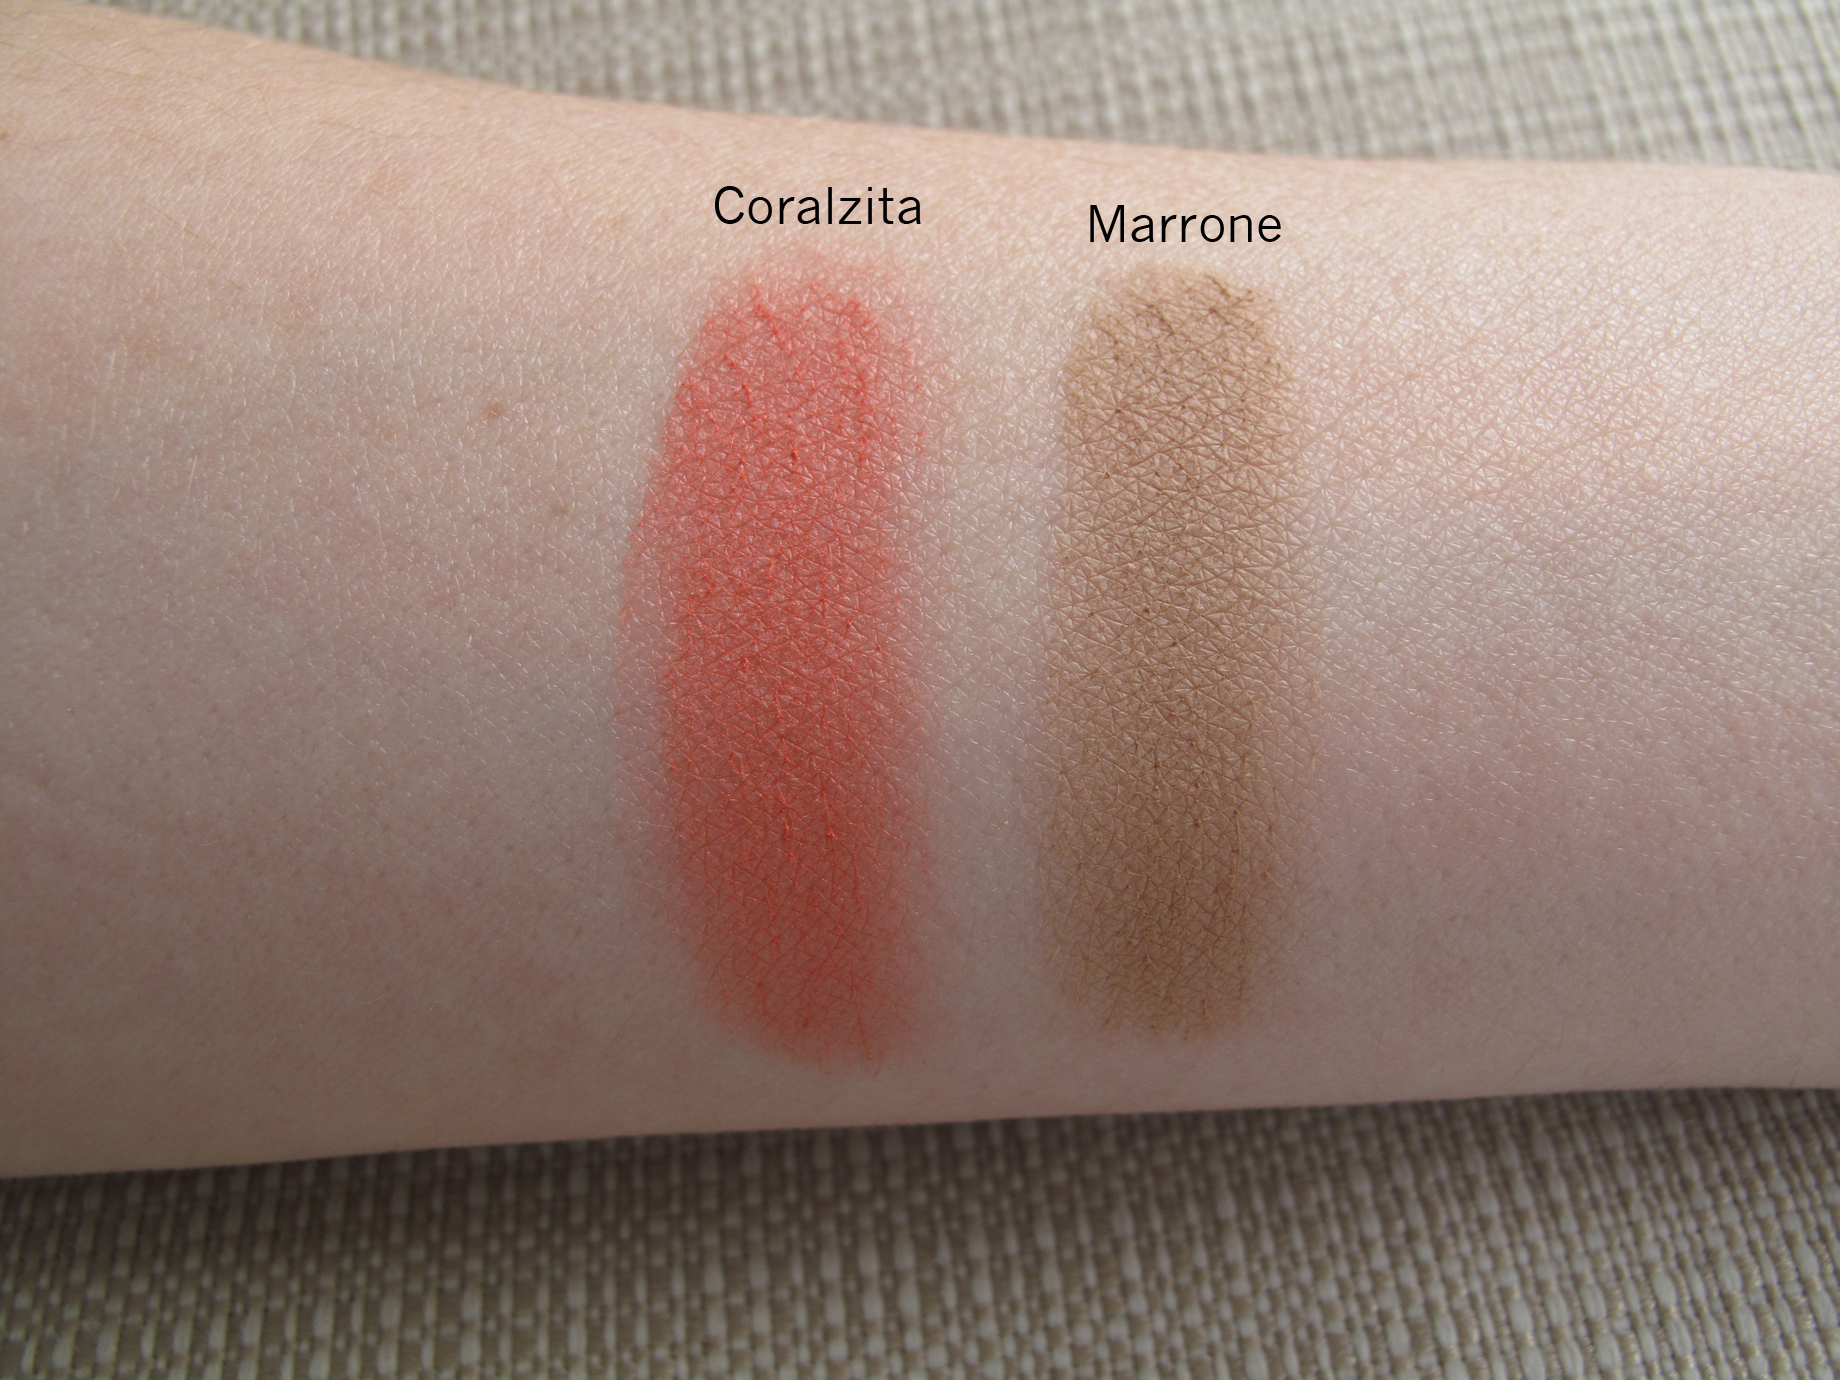 quem disse, berenice_ - Sombras Coralzita e Marrone - Swatch